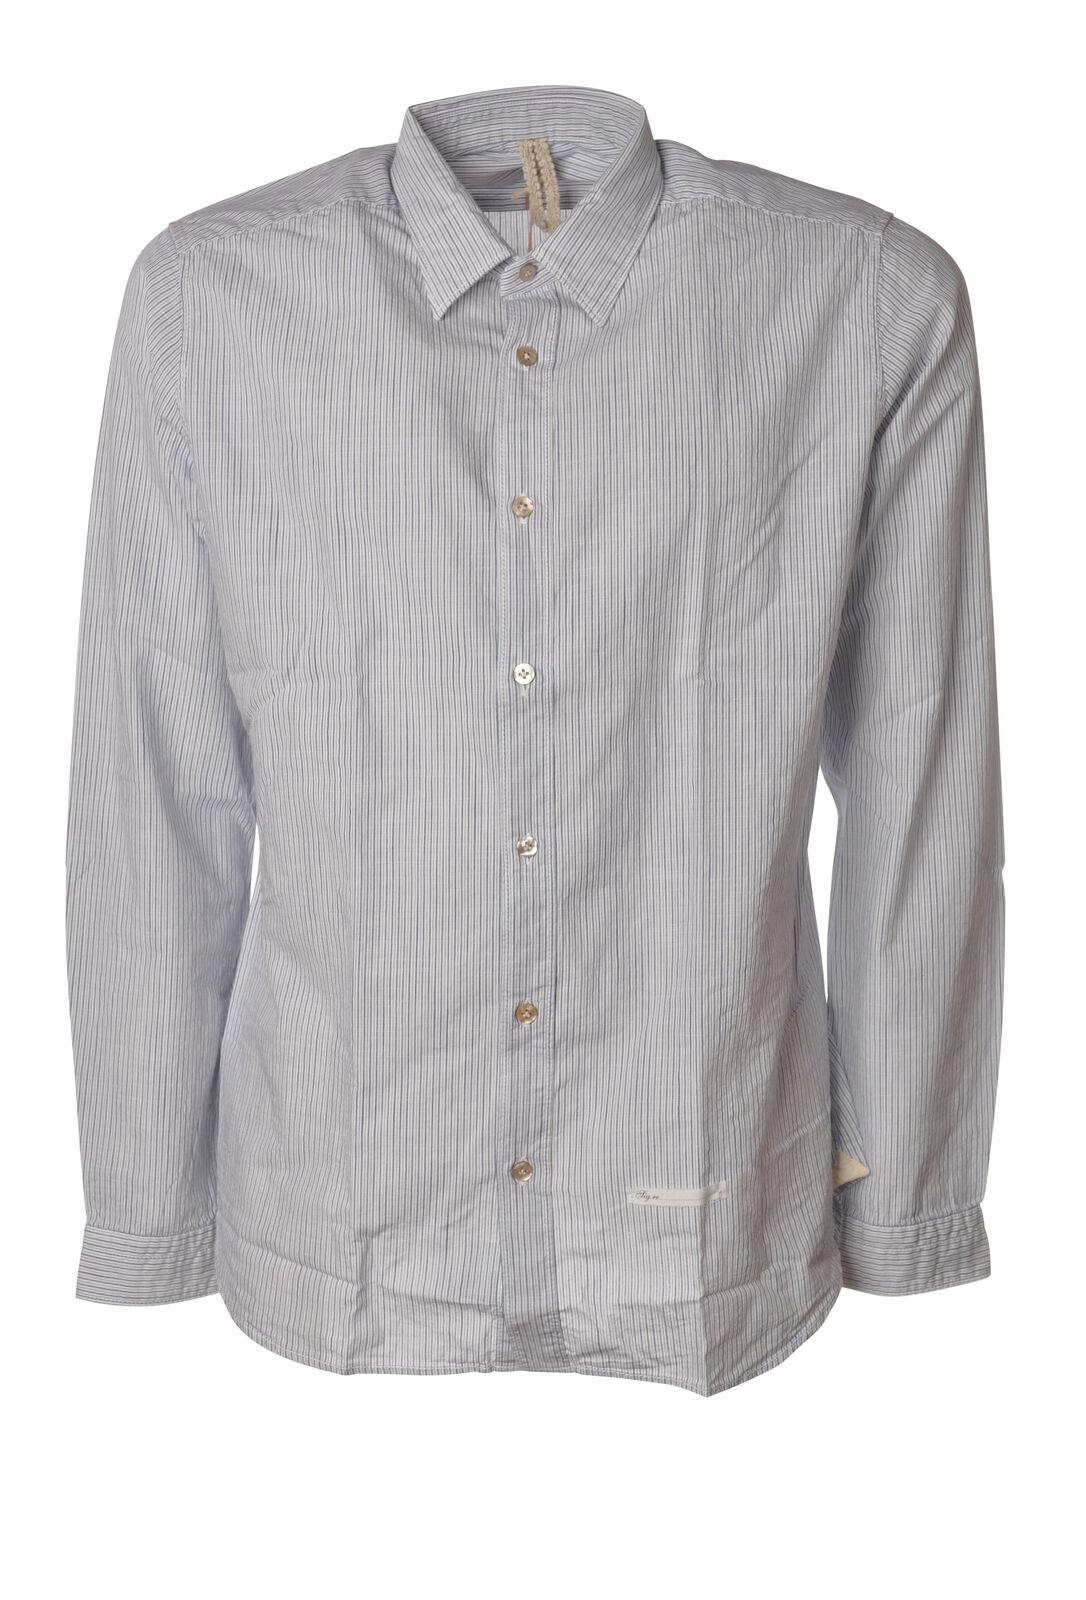 Dnl - Blausen-Shirt - Mann - Fantasie - 5631607C195110